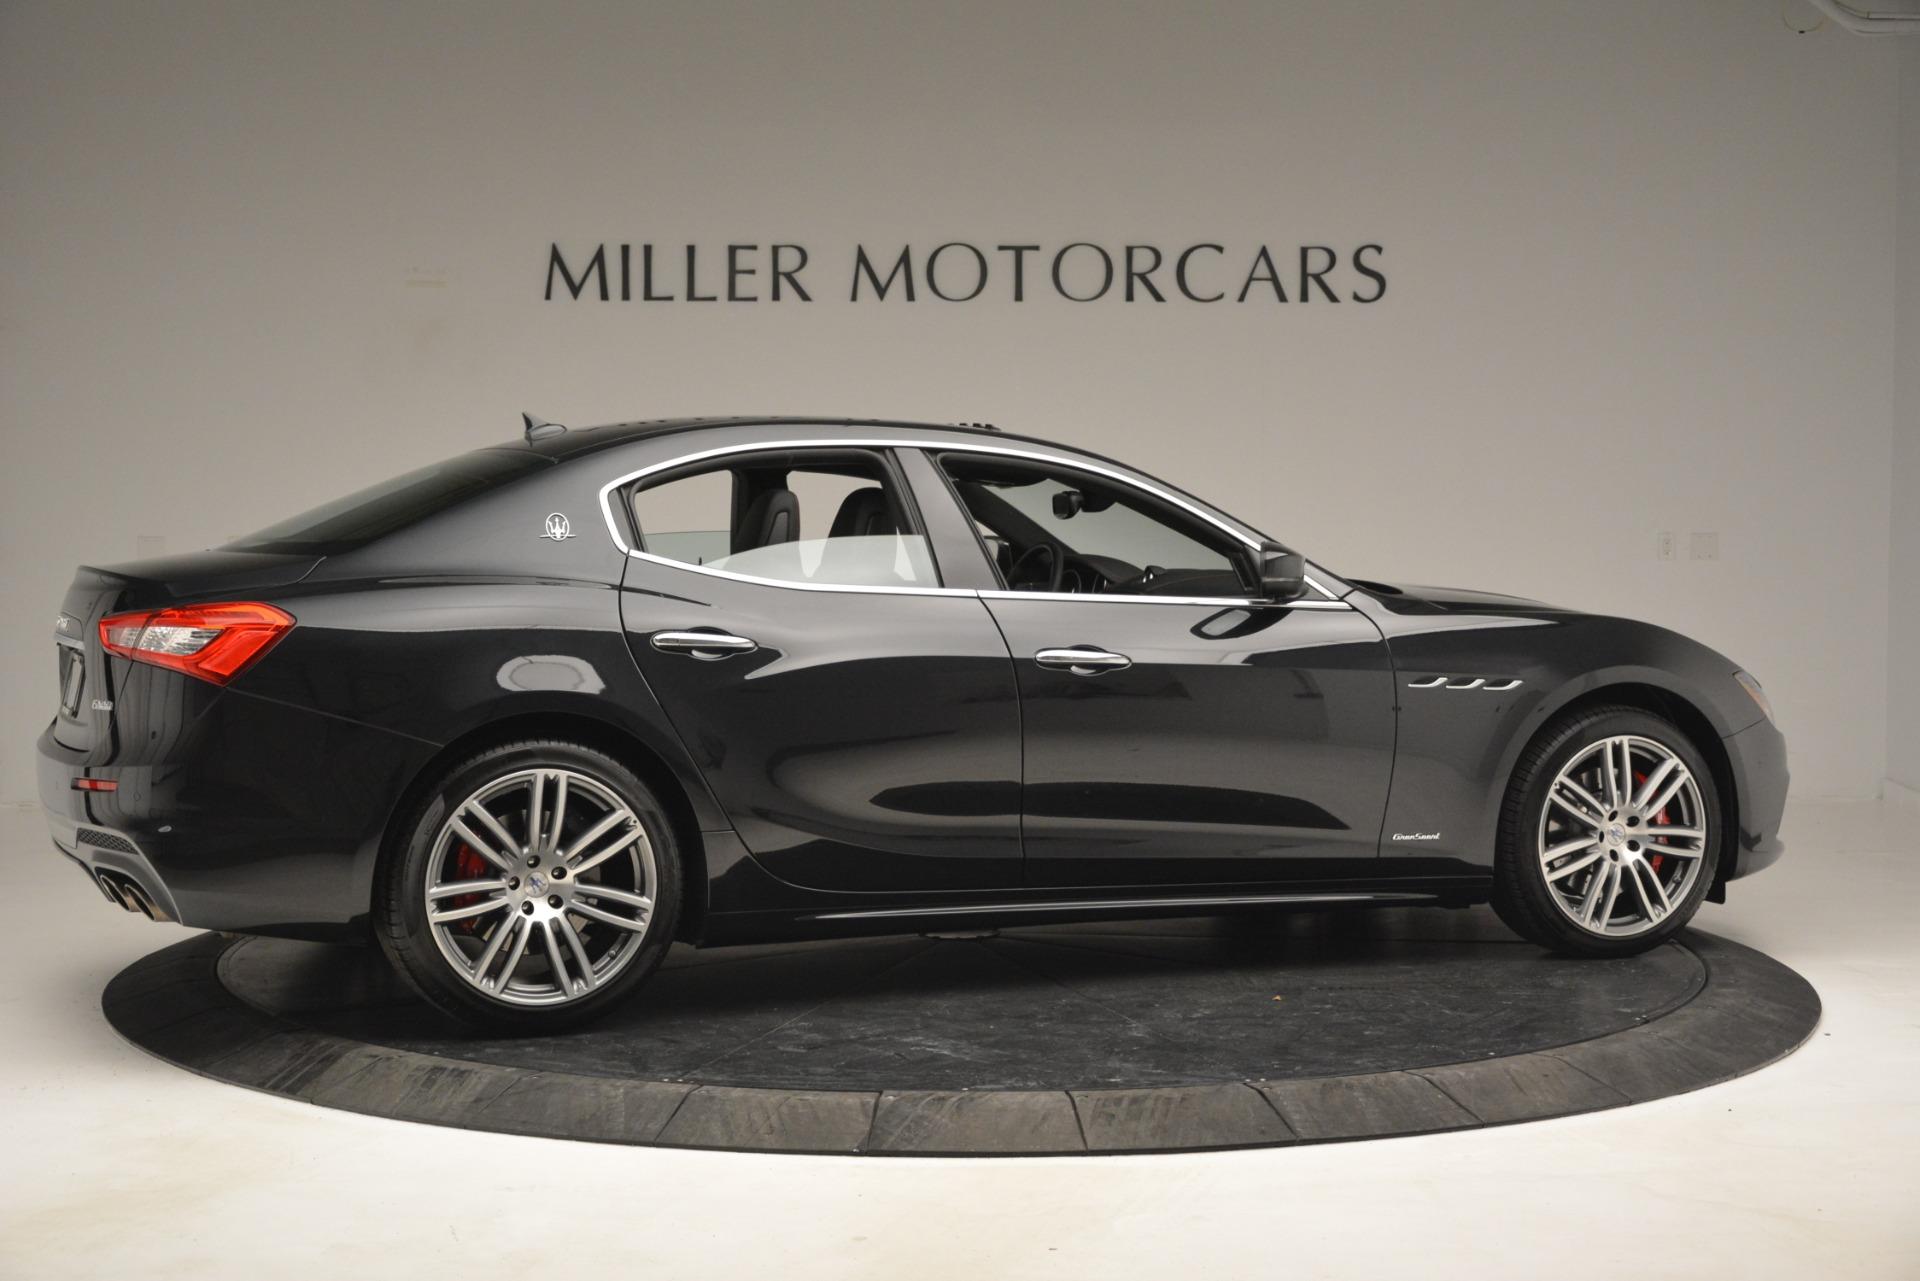 New 2019 Maserati Ghibli S Q4 GranSport For Sale In Greenwich, CT. Alfa Romeo of Greenwich, W634 2614_p9